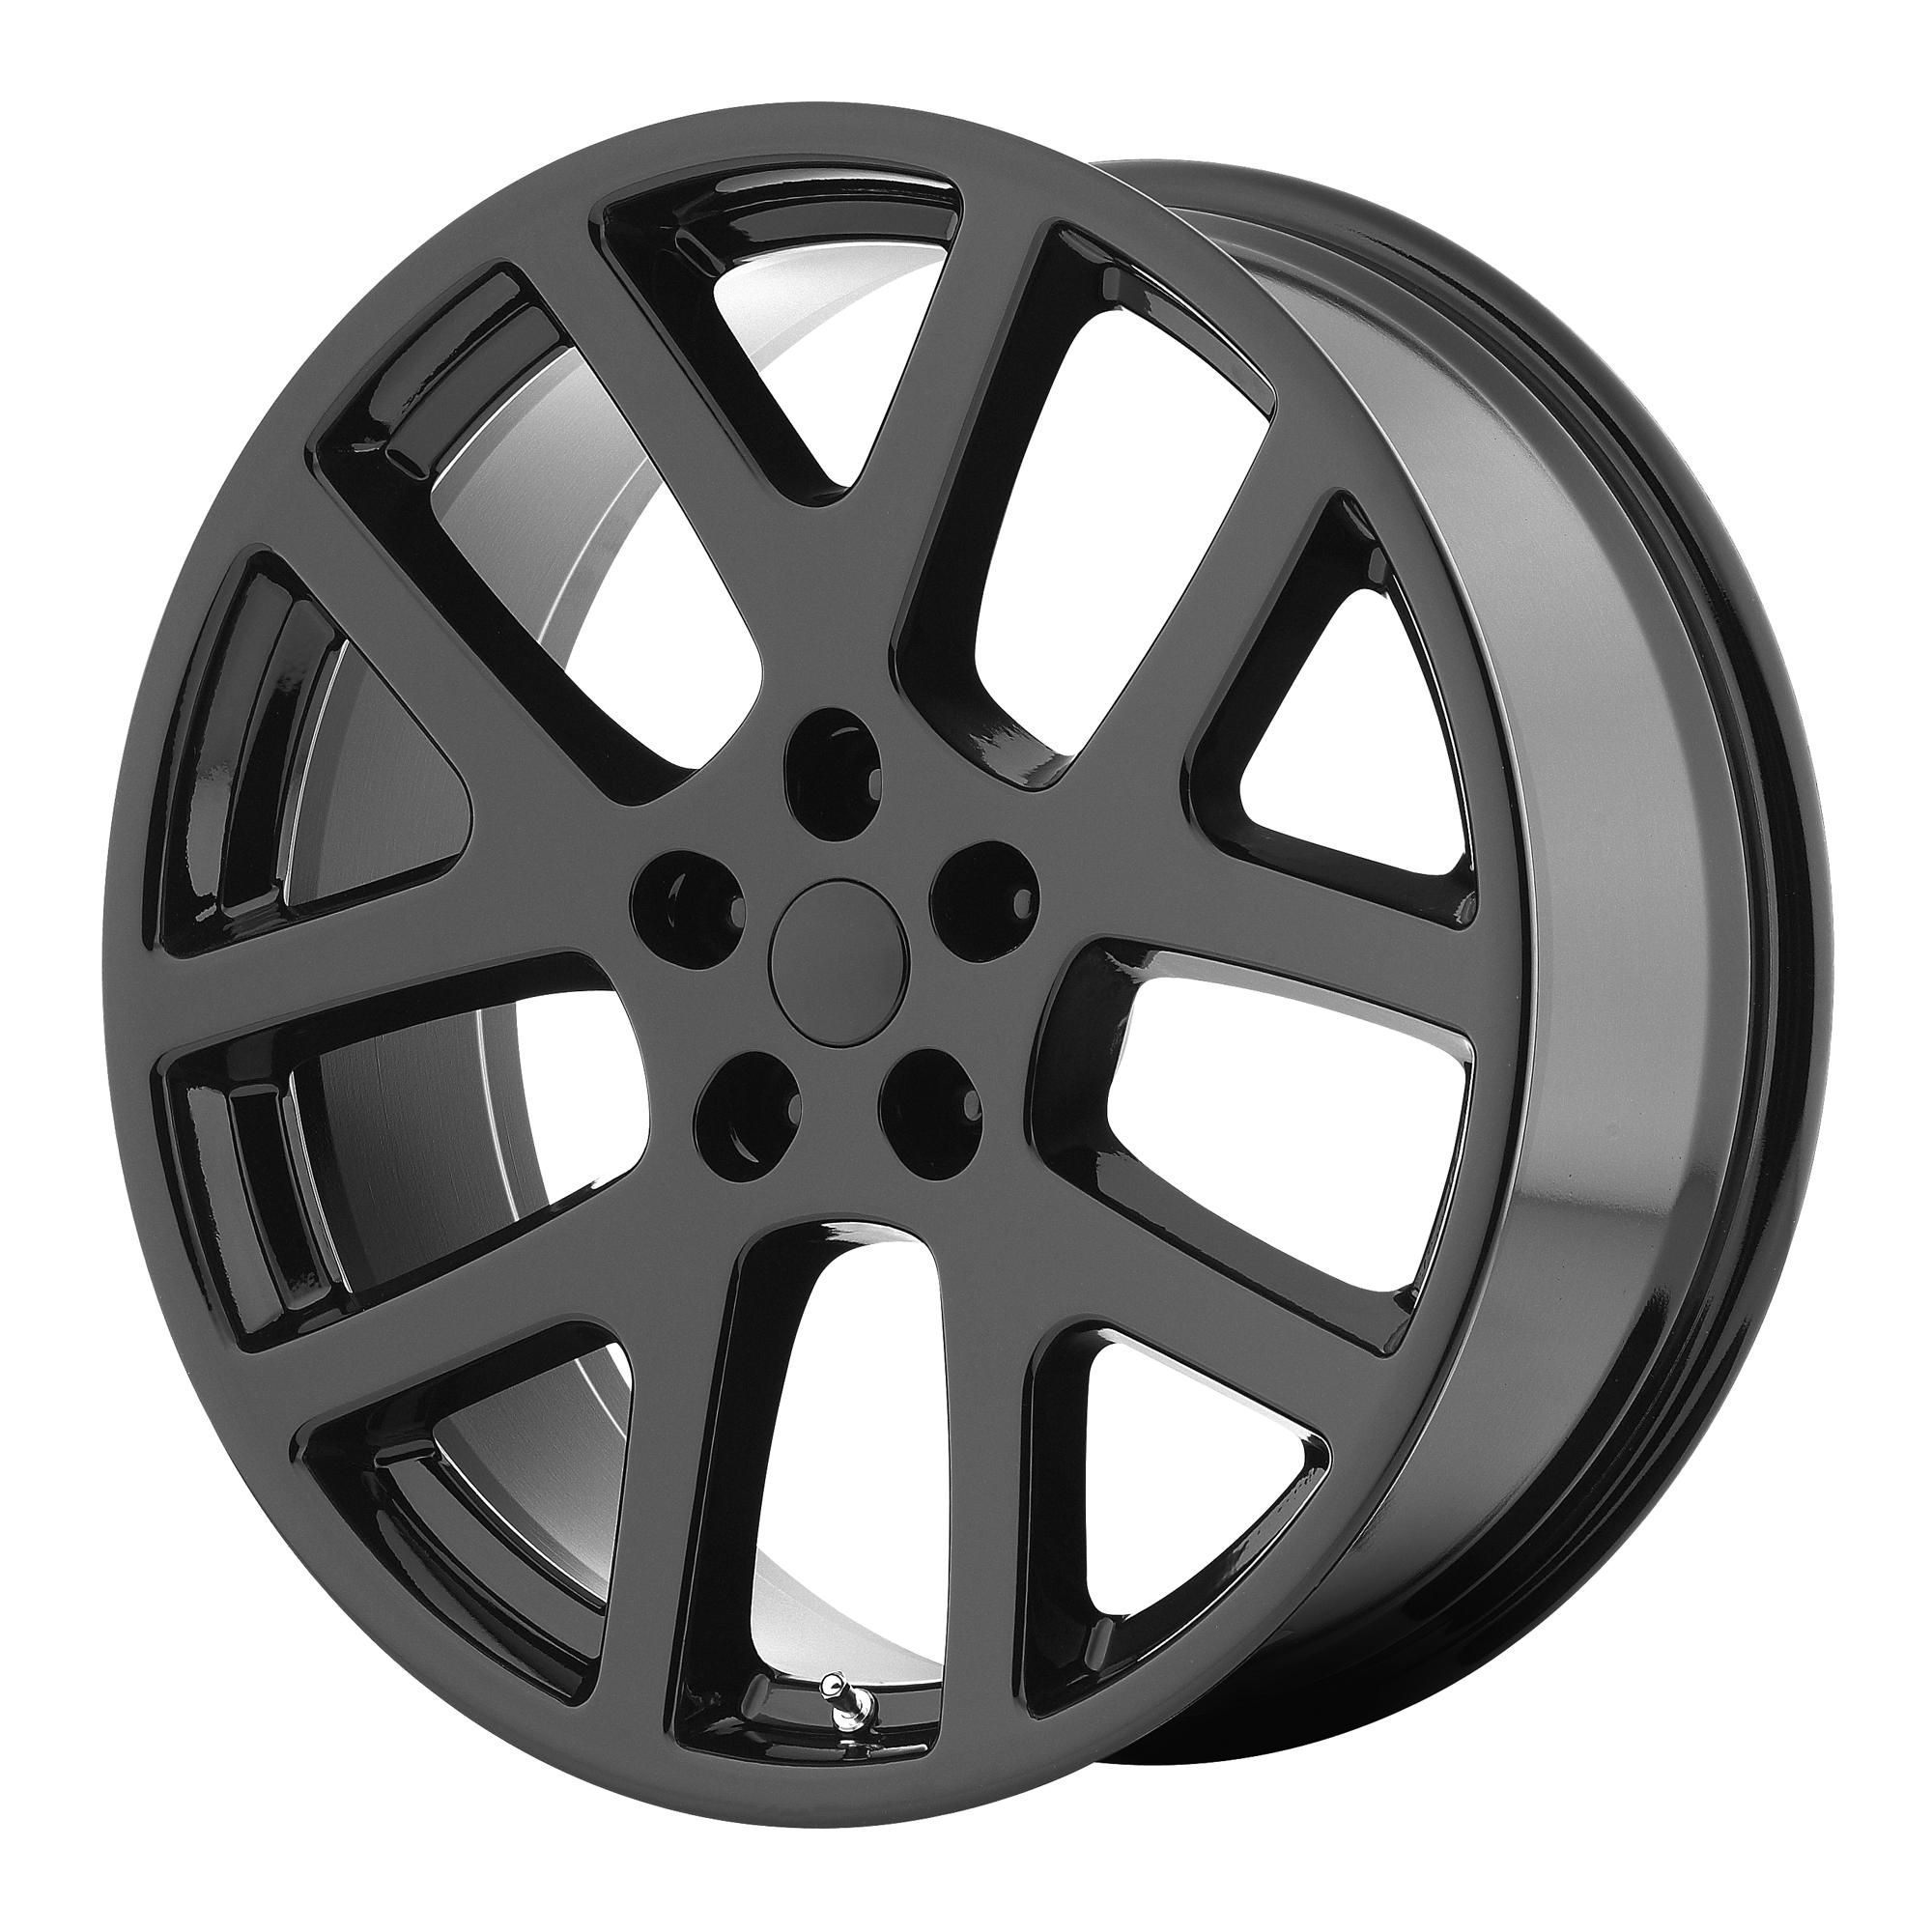 OE Creations Replica Wheels OE Creations PR149 Gloss Black w/ Clear Coat